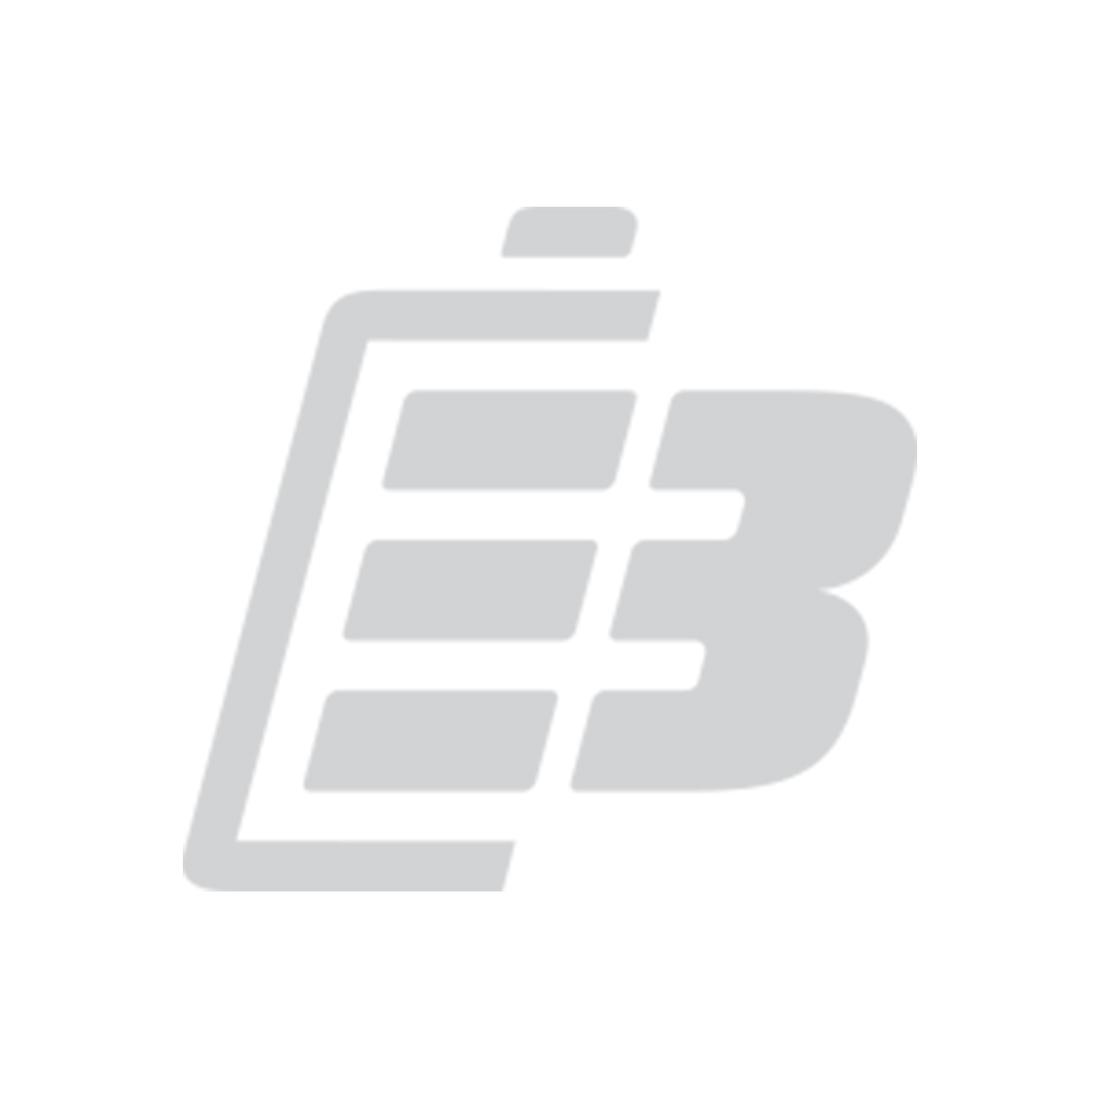 Cordless phone battery Uniden 5105_1